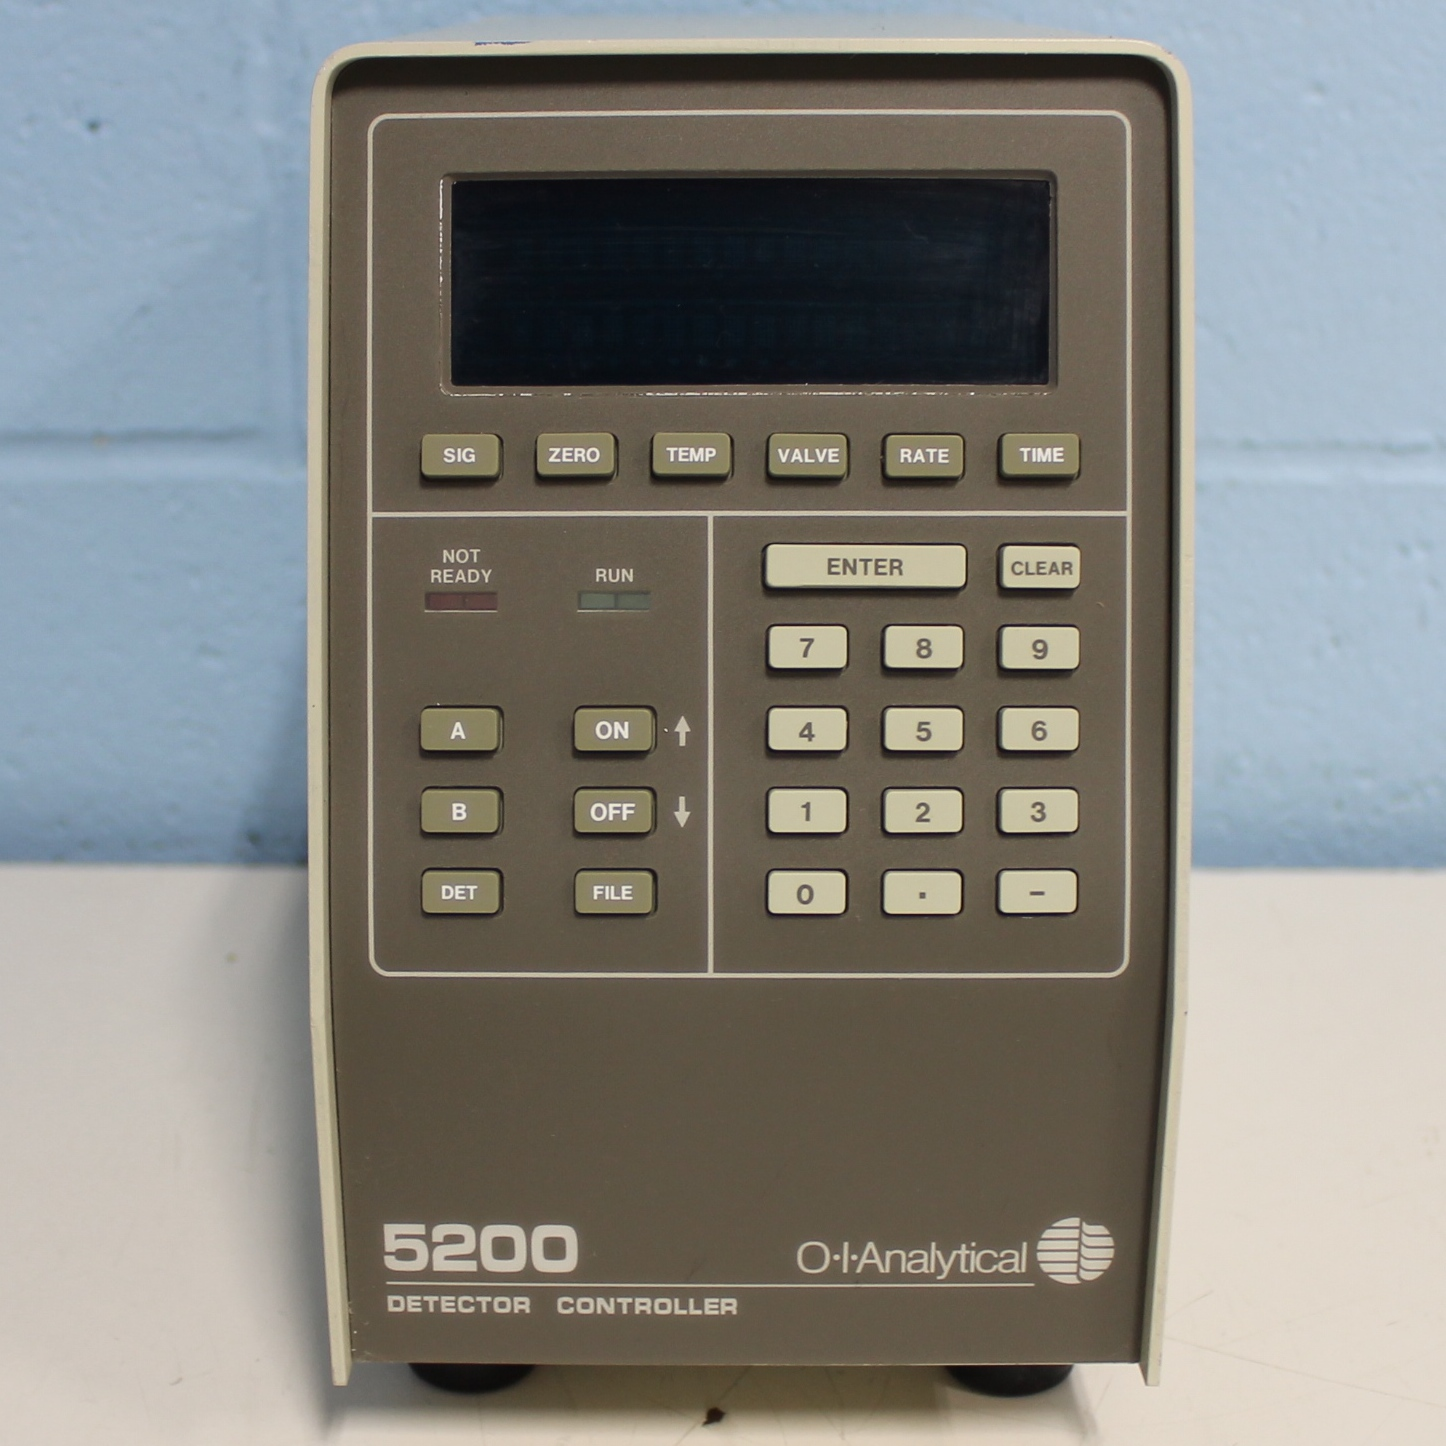 O.I.Analytical 5200 Detector Controller Image